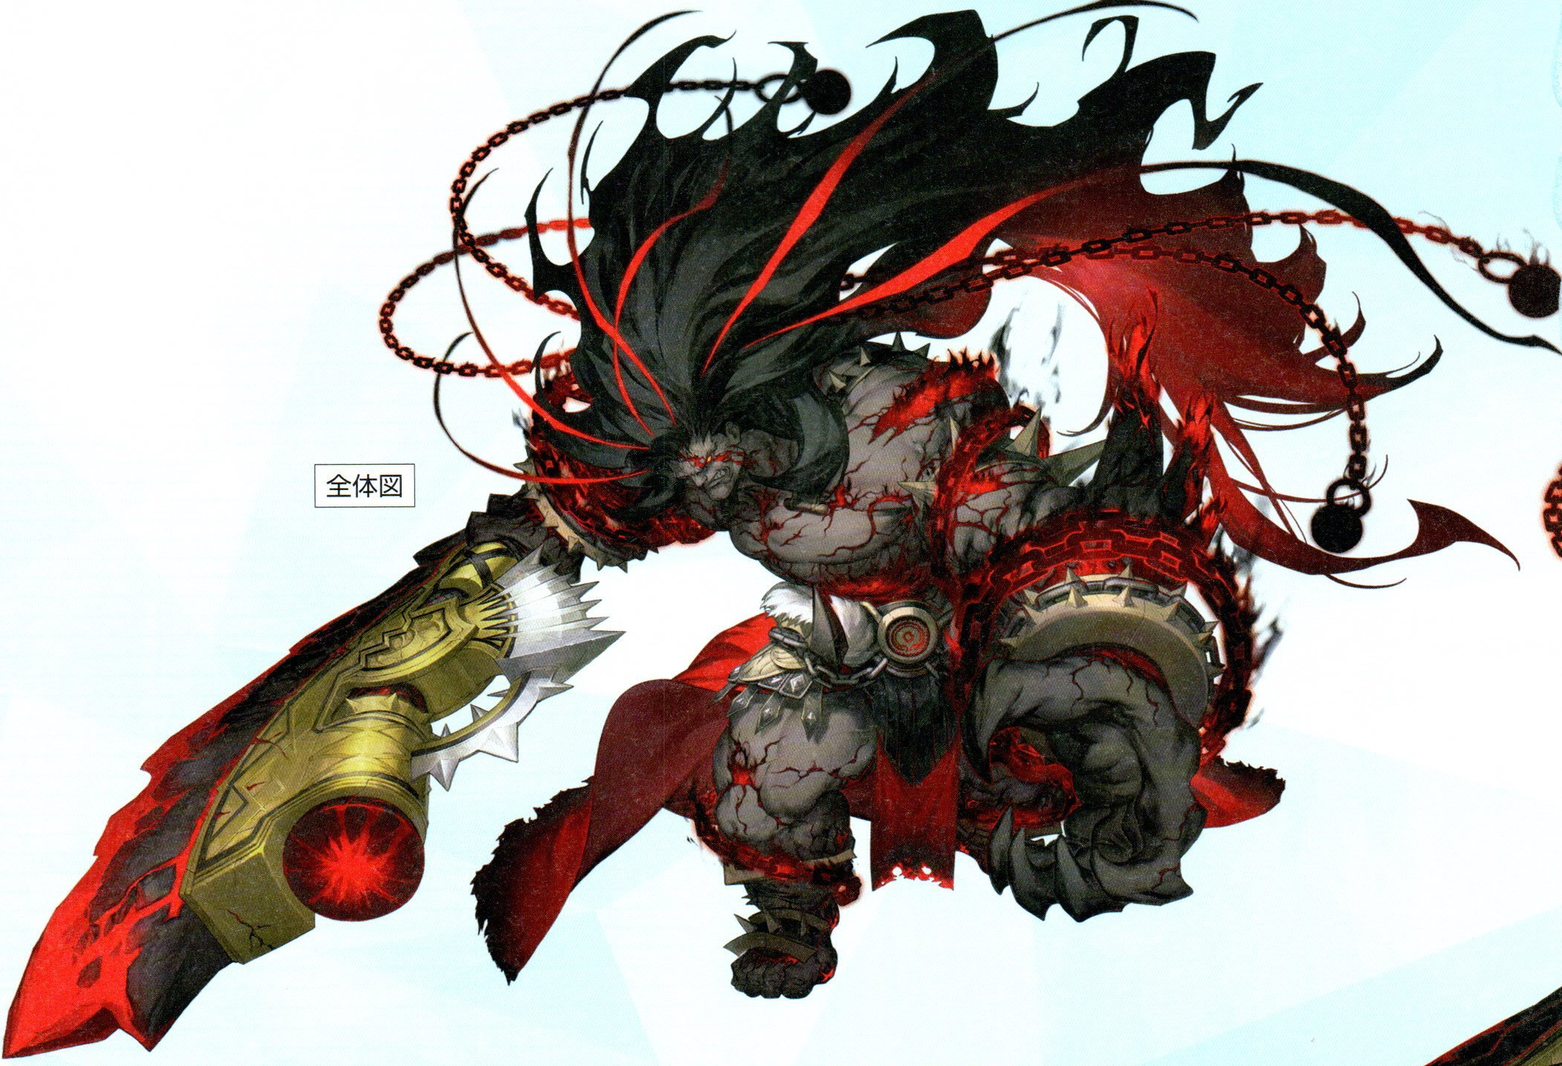 Berserker (Fate/Grand Order - Megalos)